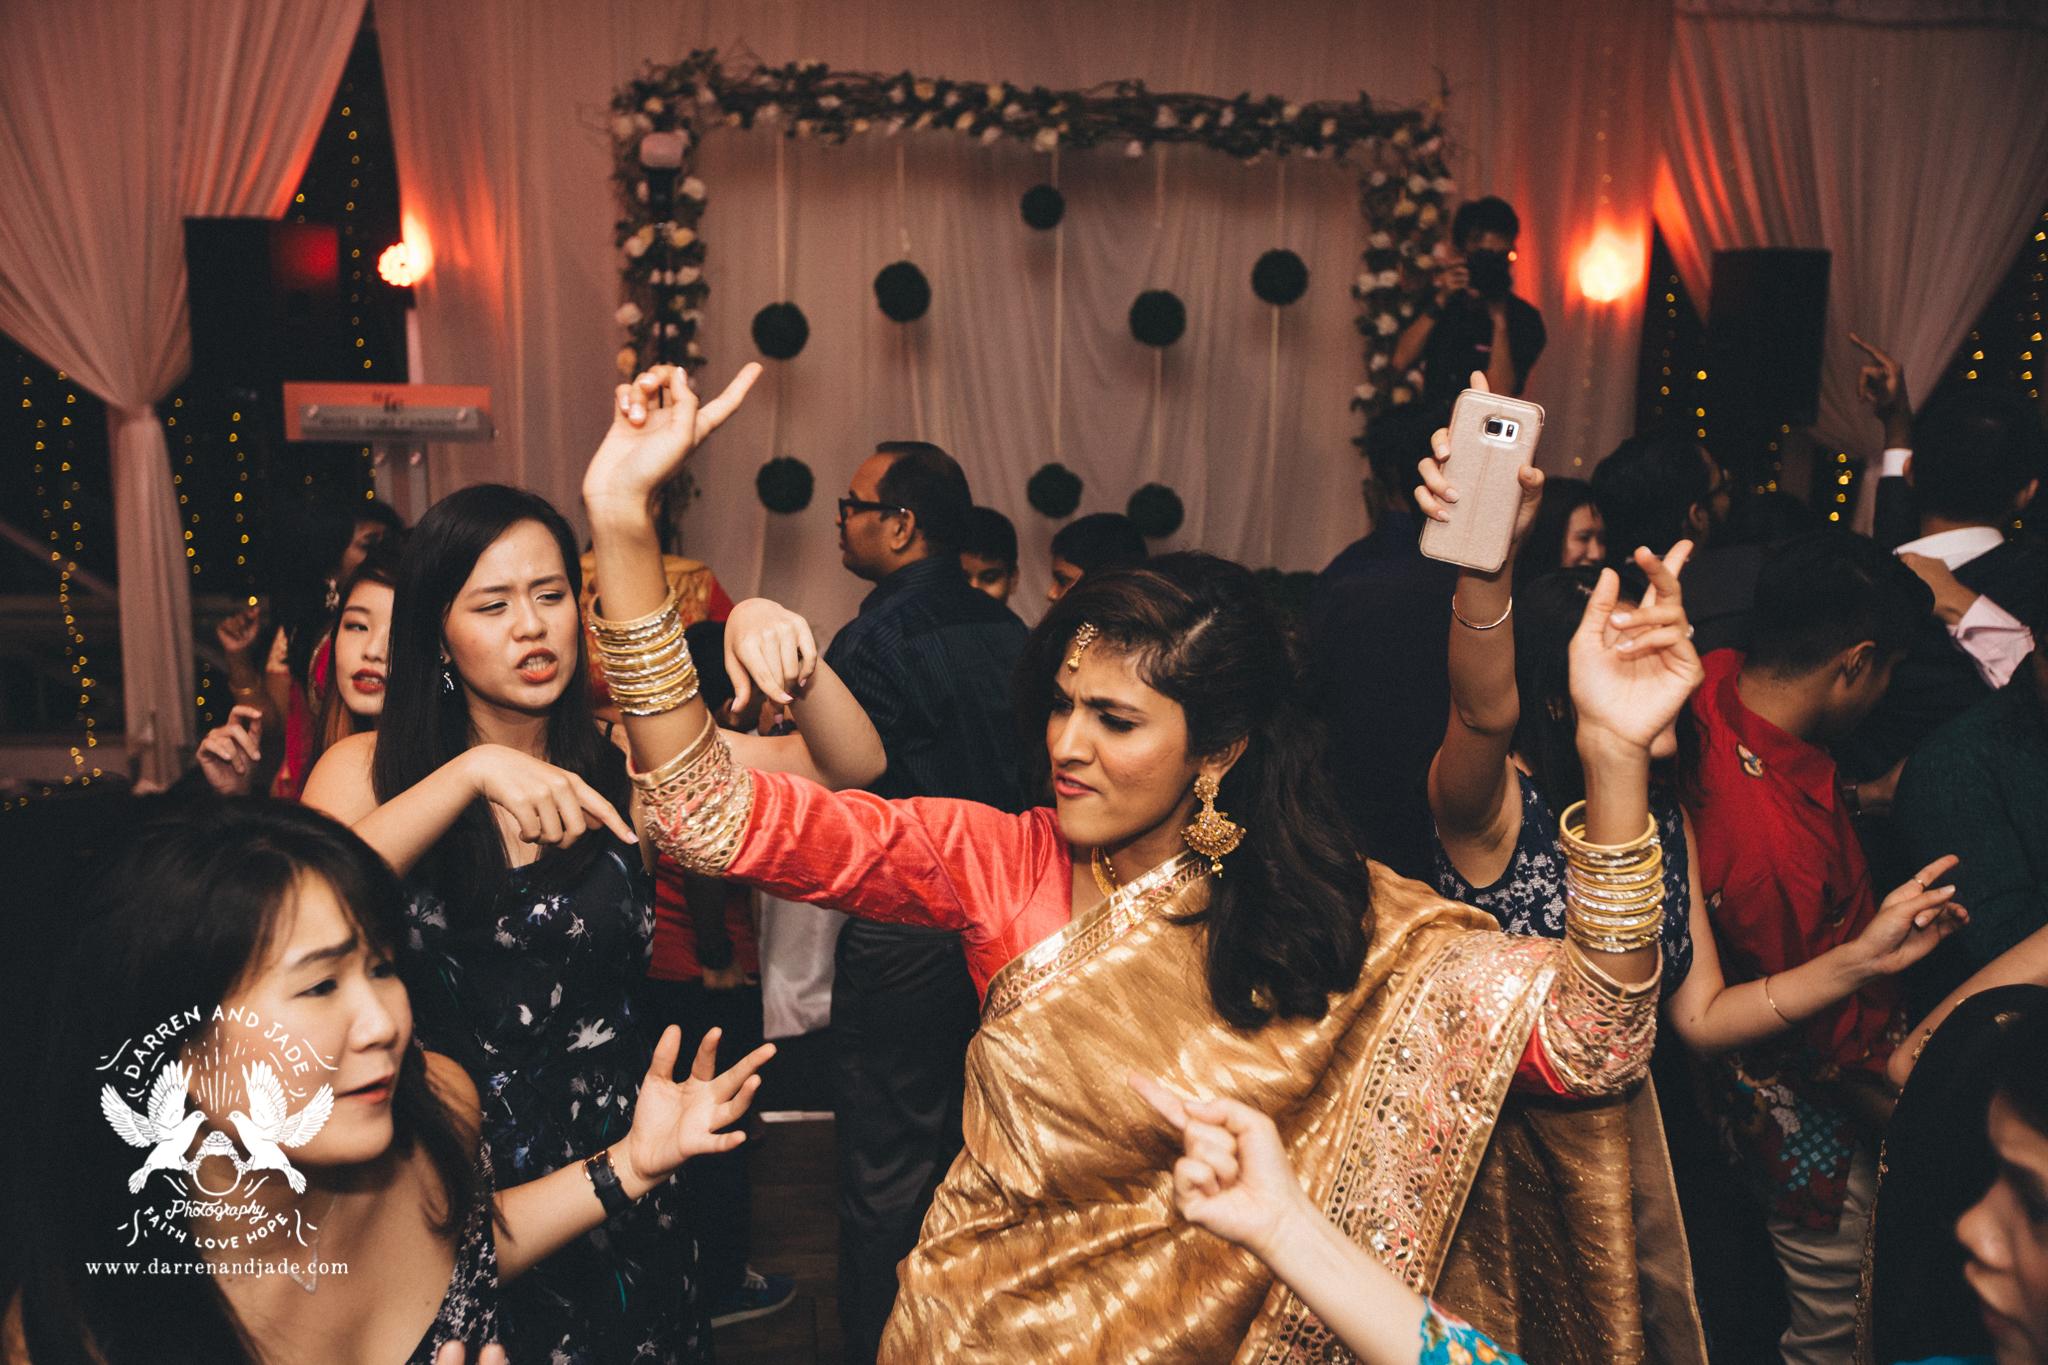 Amitha & Kumuthan - Wedding Blog (59 of 60).jpg